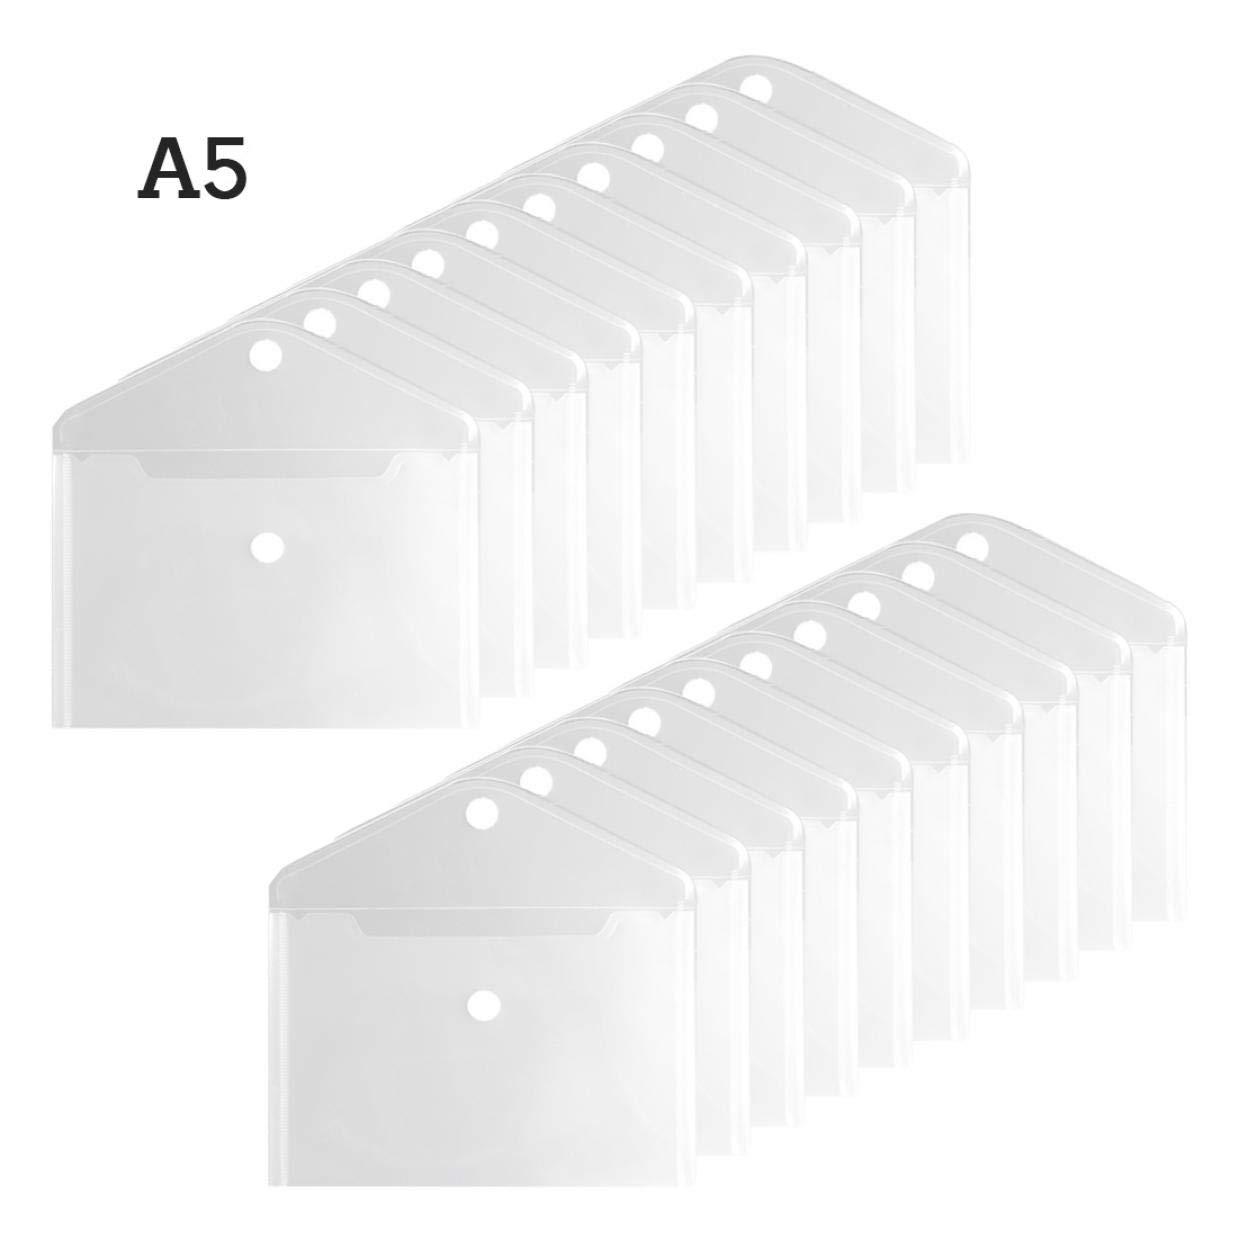 TIENO A5 Hook & Loop Closure Envelopes Clear Side Loading Pocket Durable Receipt Bill Office Bulk Organize 20PCS